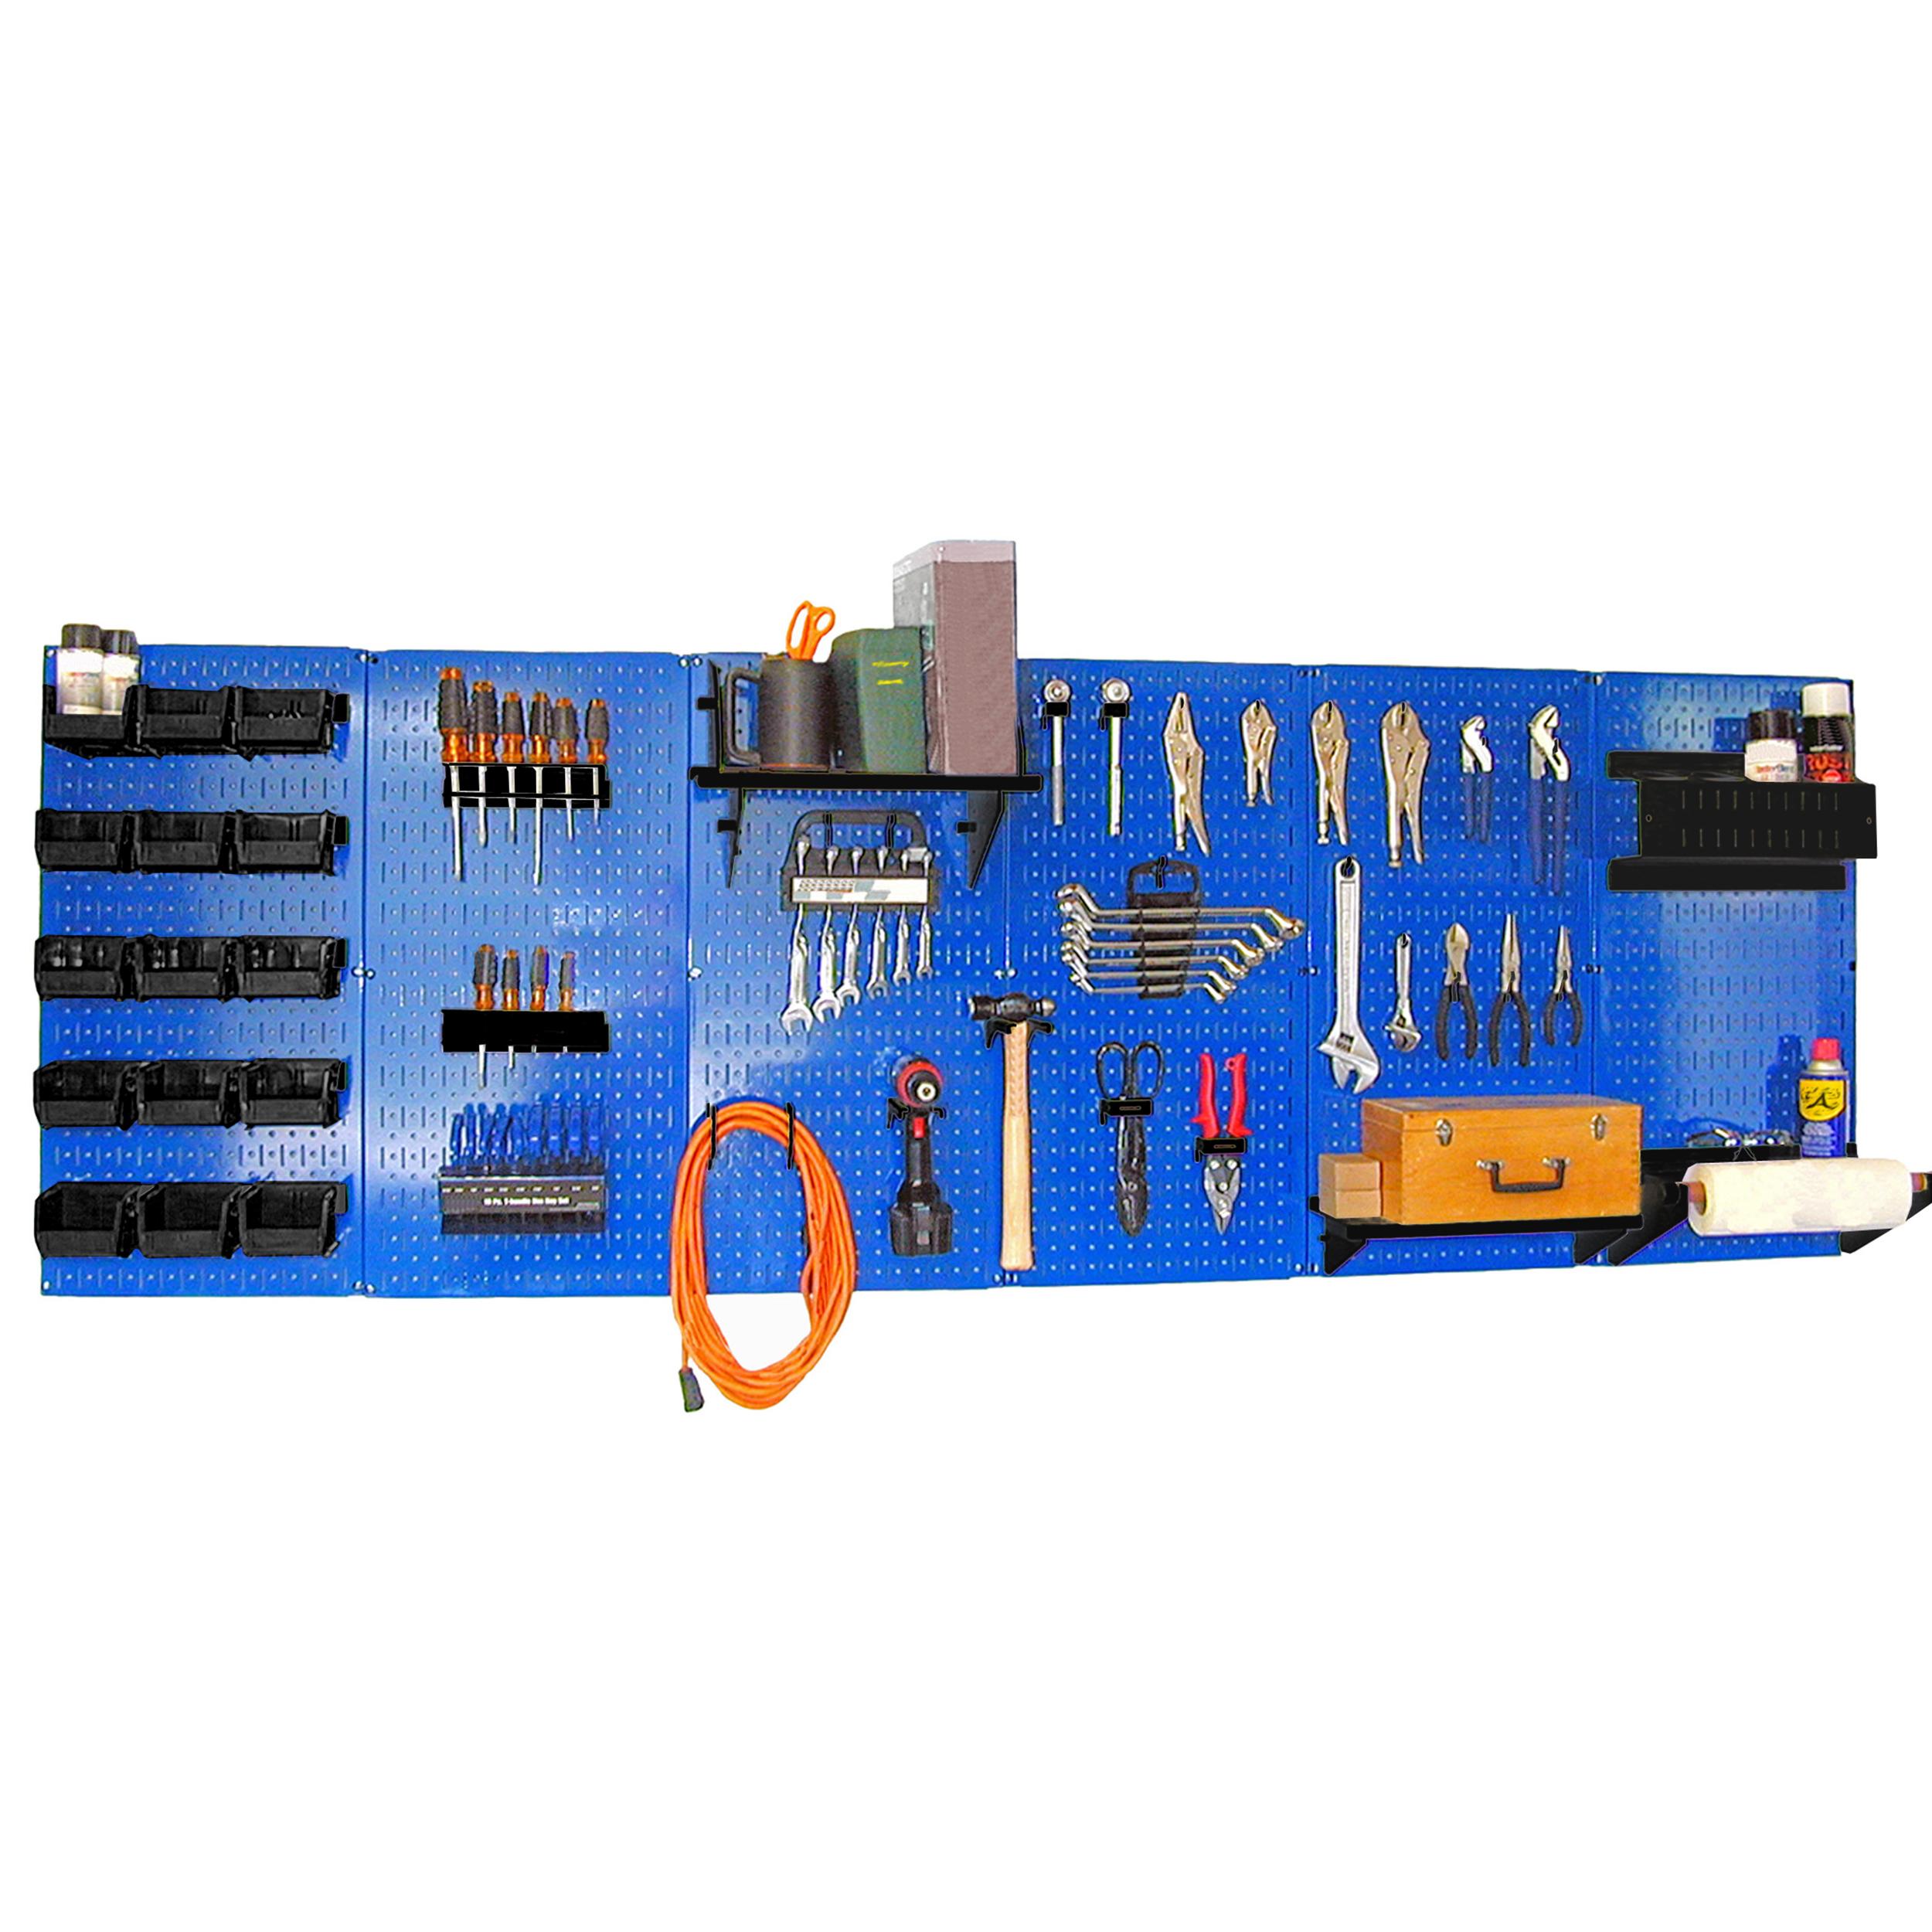 8' Metal Pegboard Master Workbench Kit - Blue Toolboard & Black Accessories